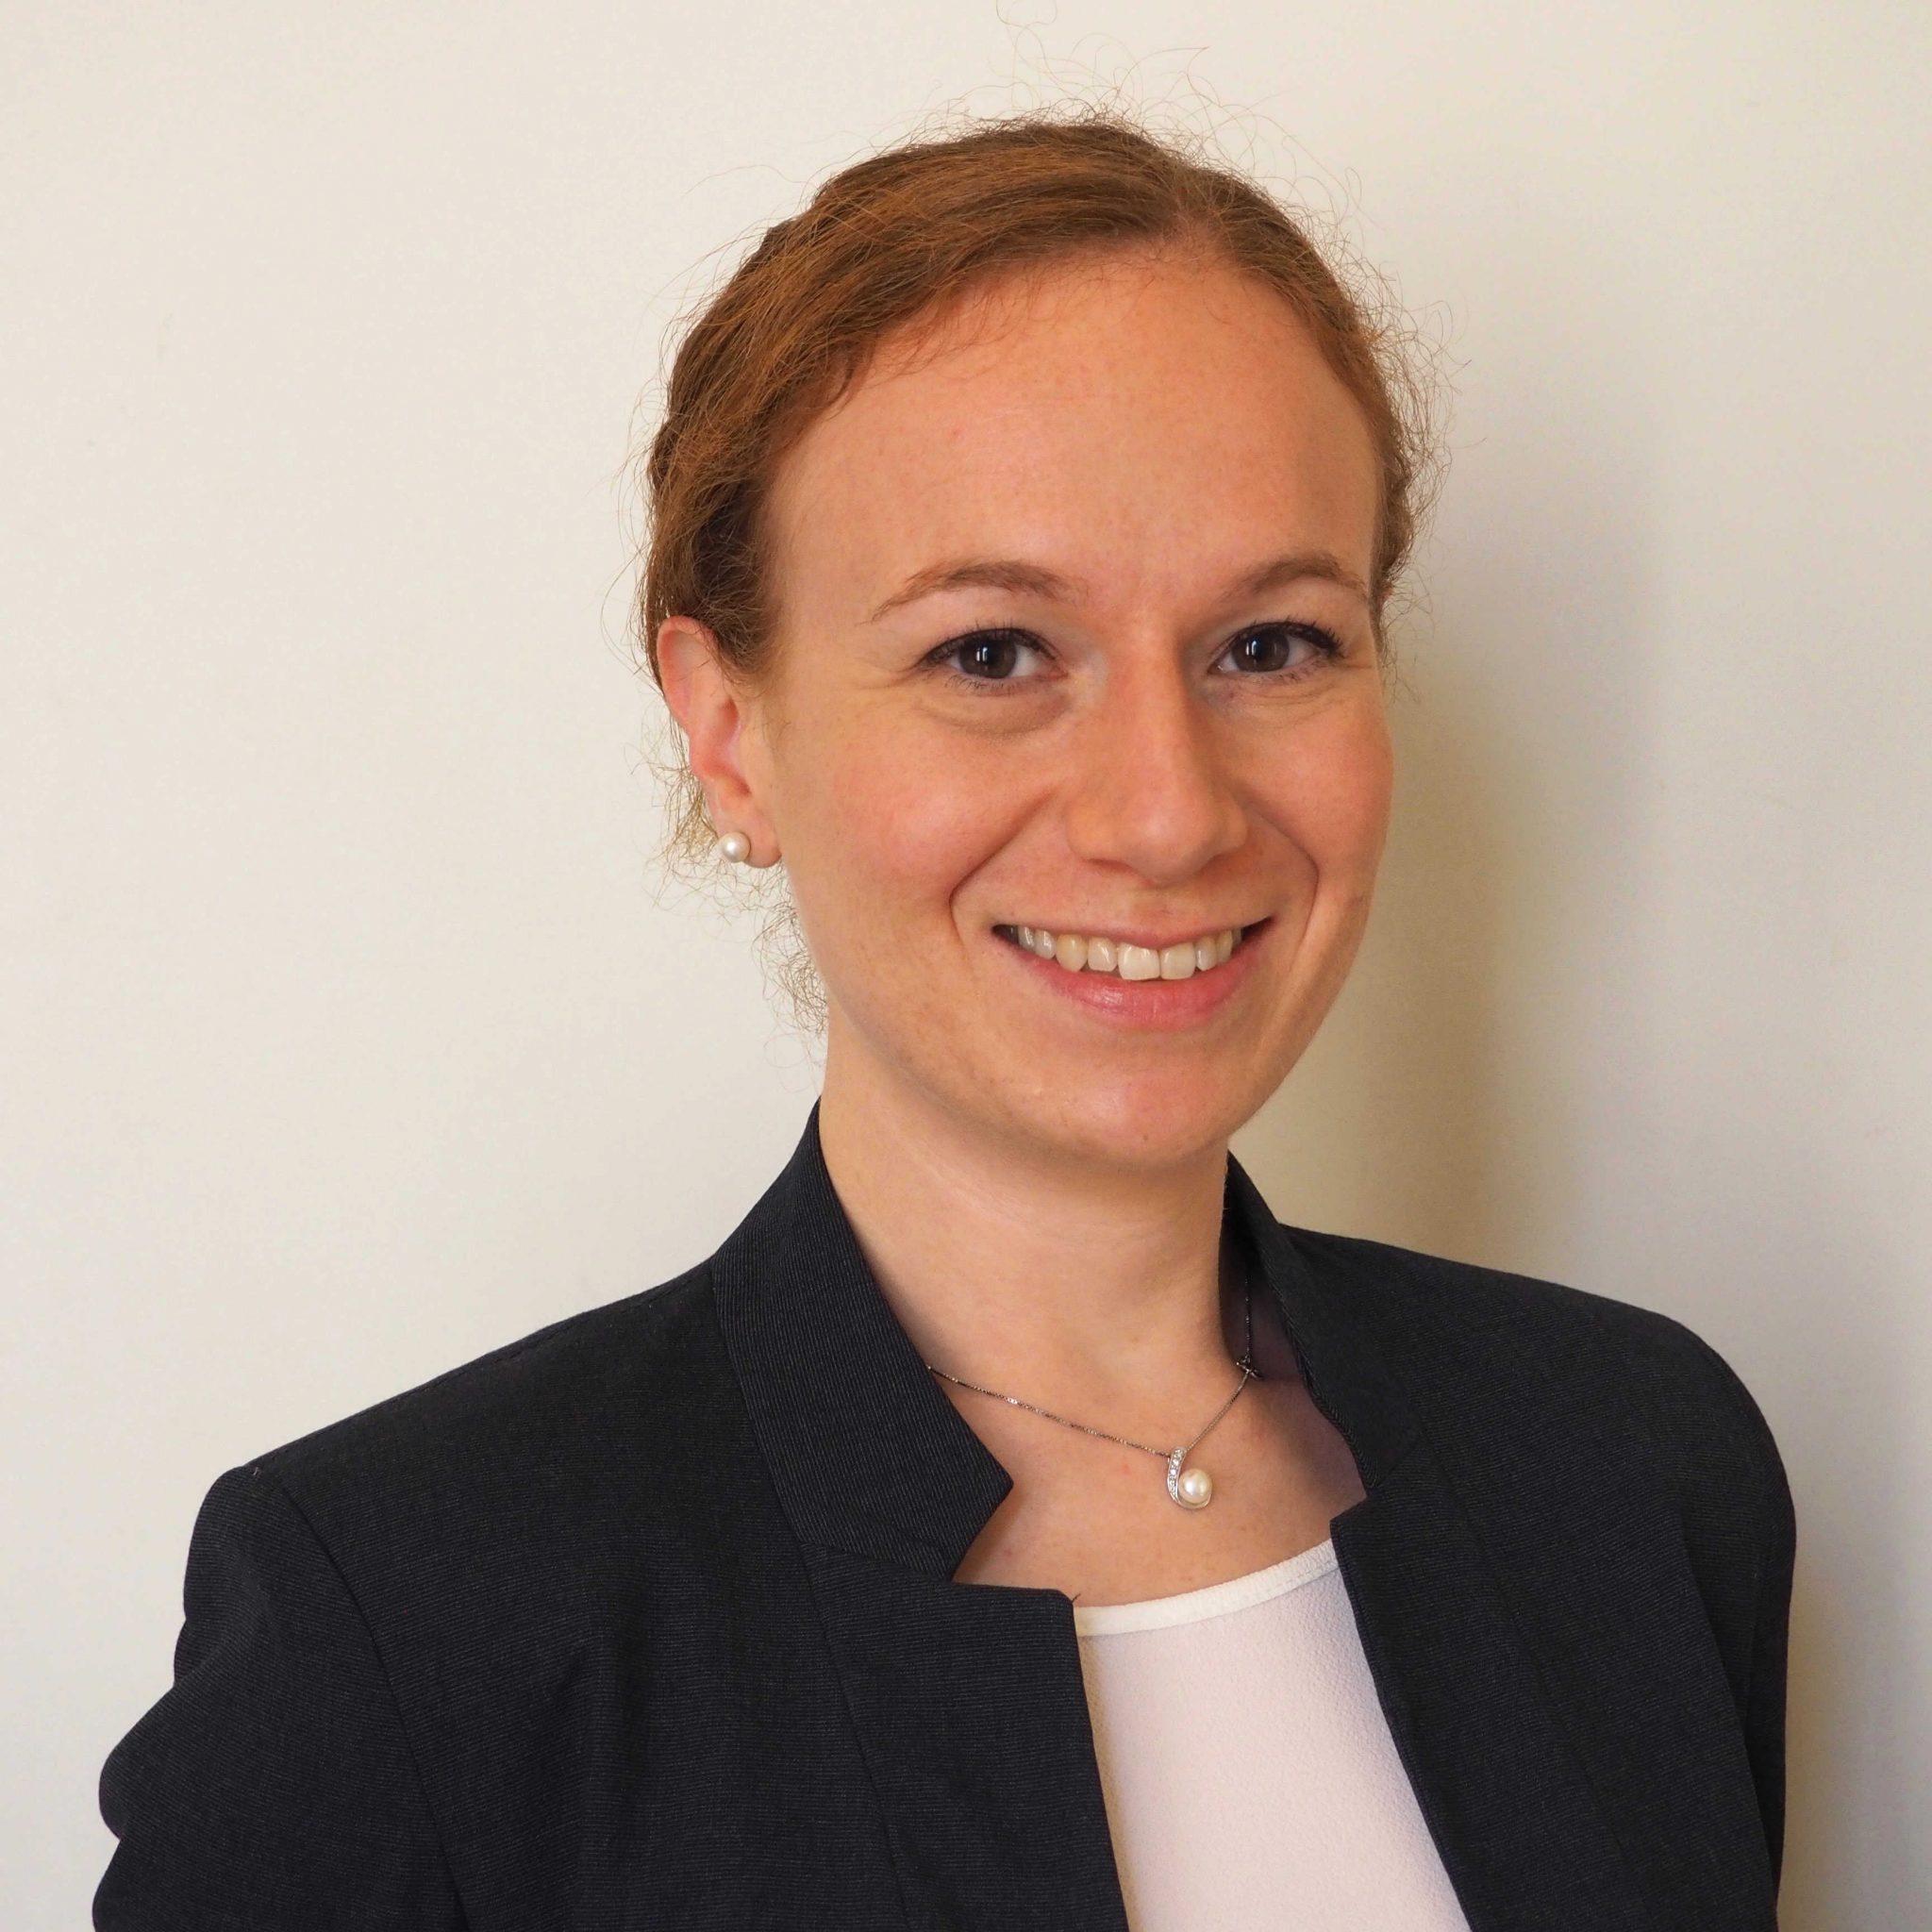 Annalisa Volpato